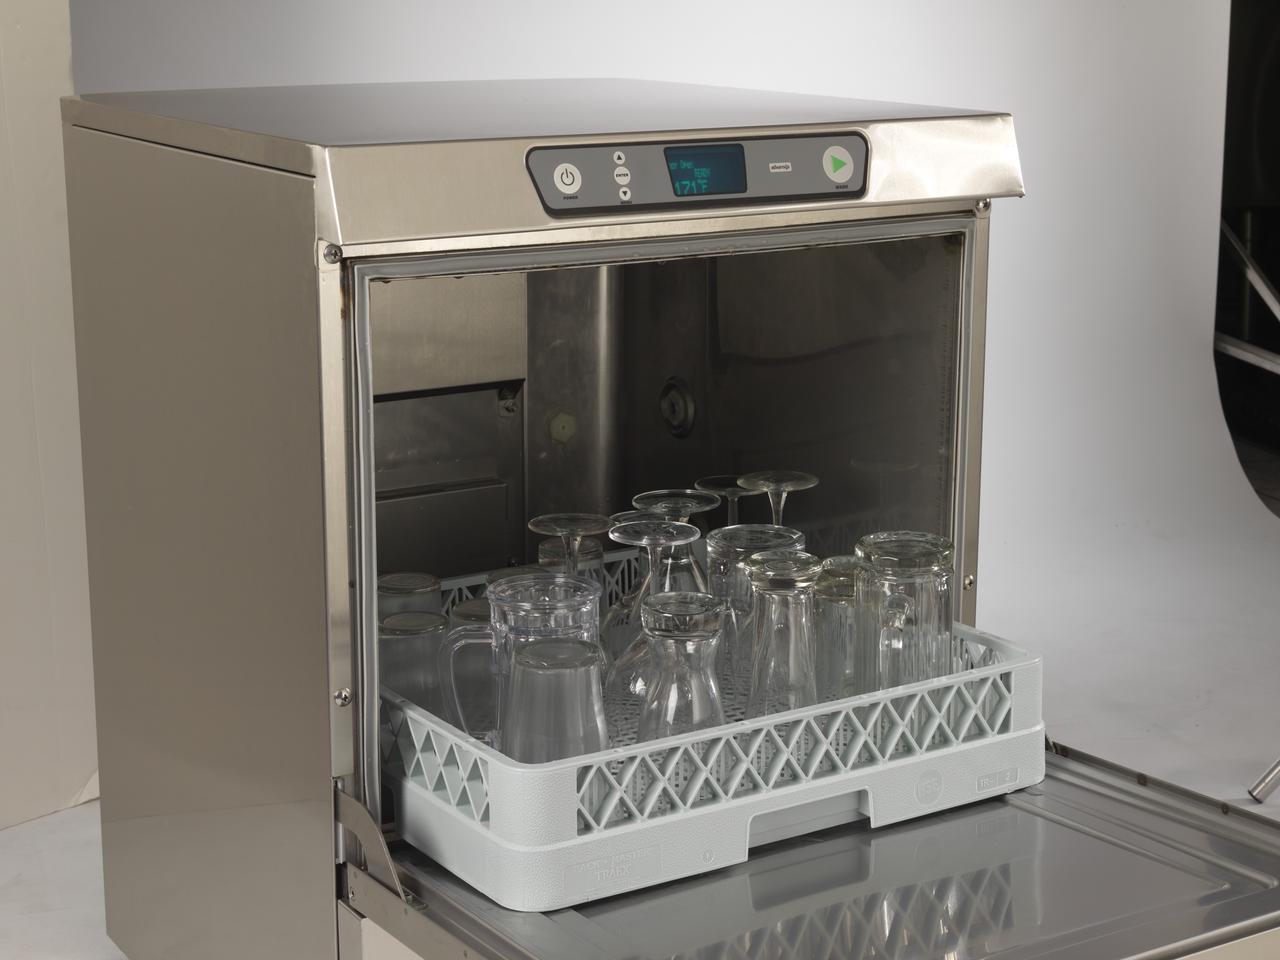 Advansys™ LXe Undercounter Dishwasher   Hobart on